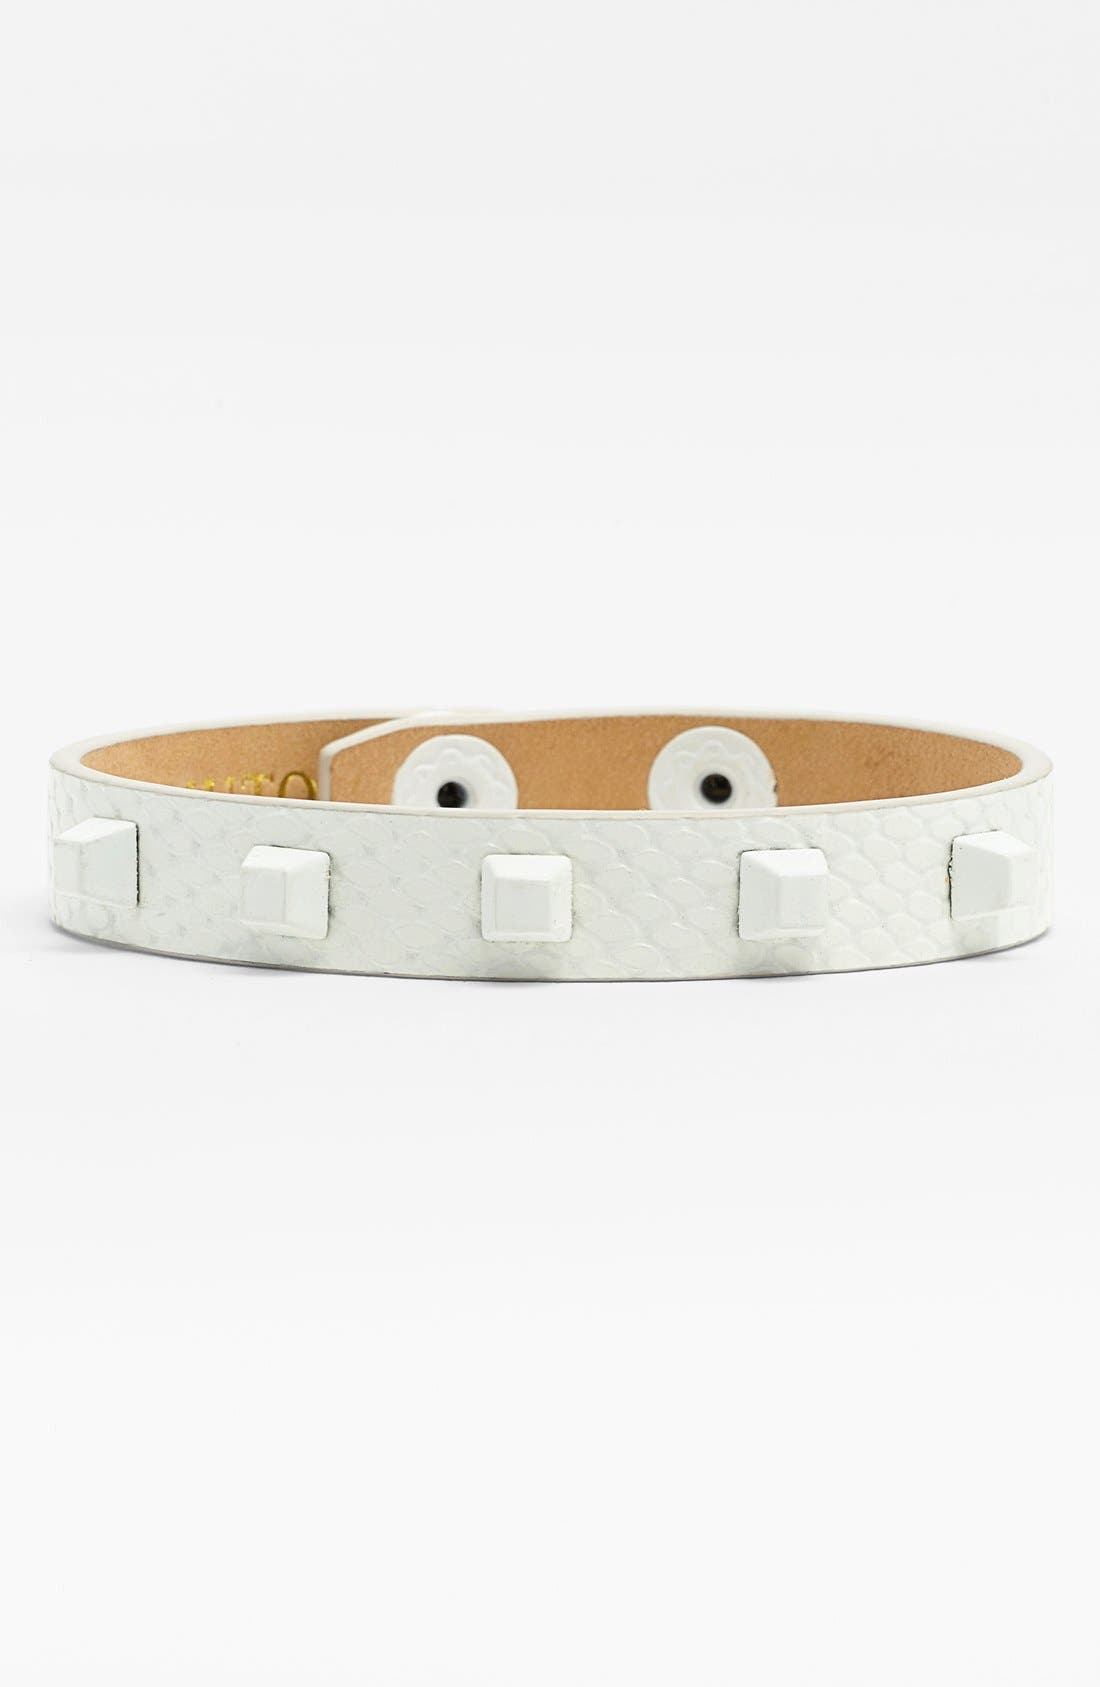 Studded Leather Bracelet,                         Main,                         color, White/ Matte White